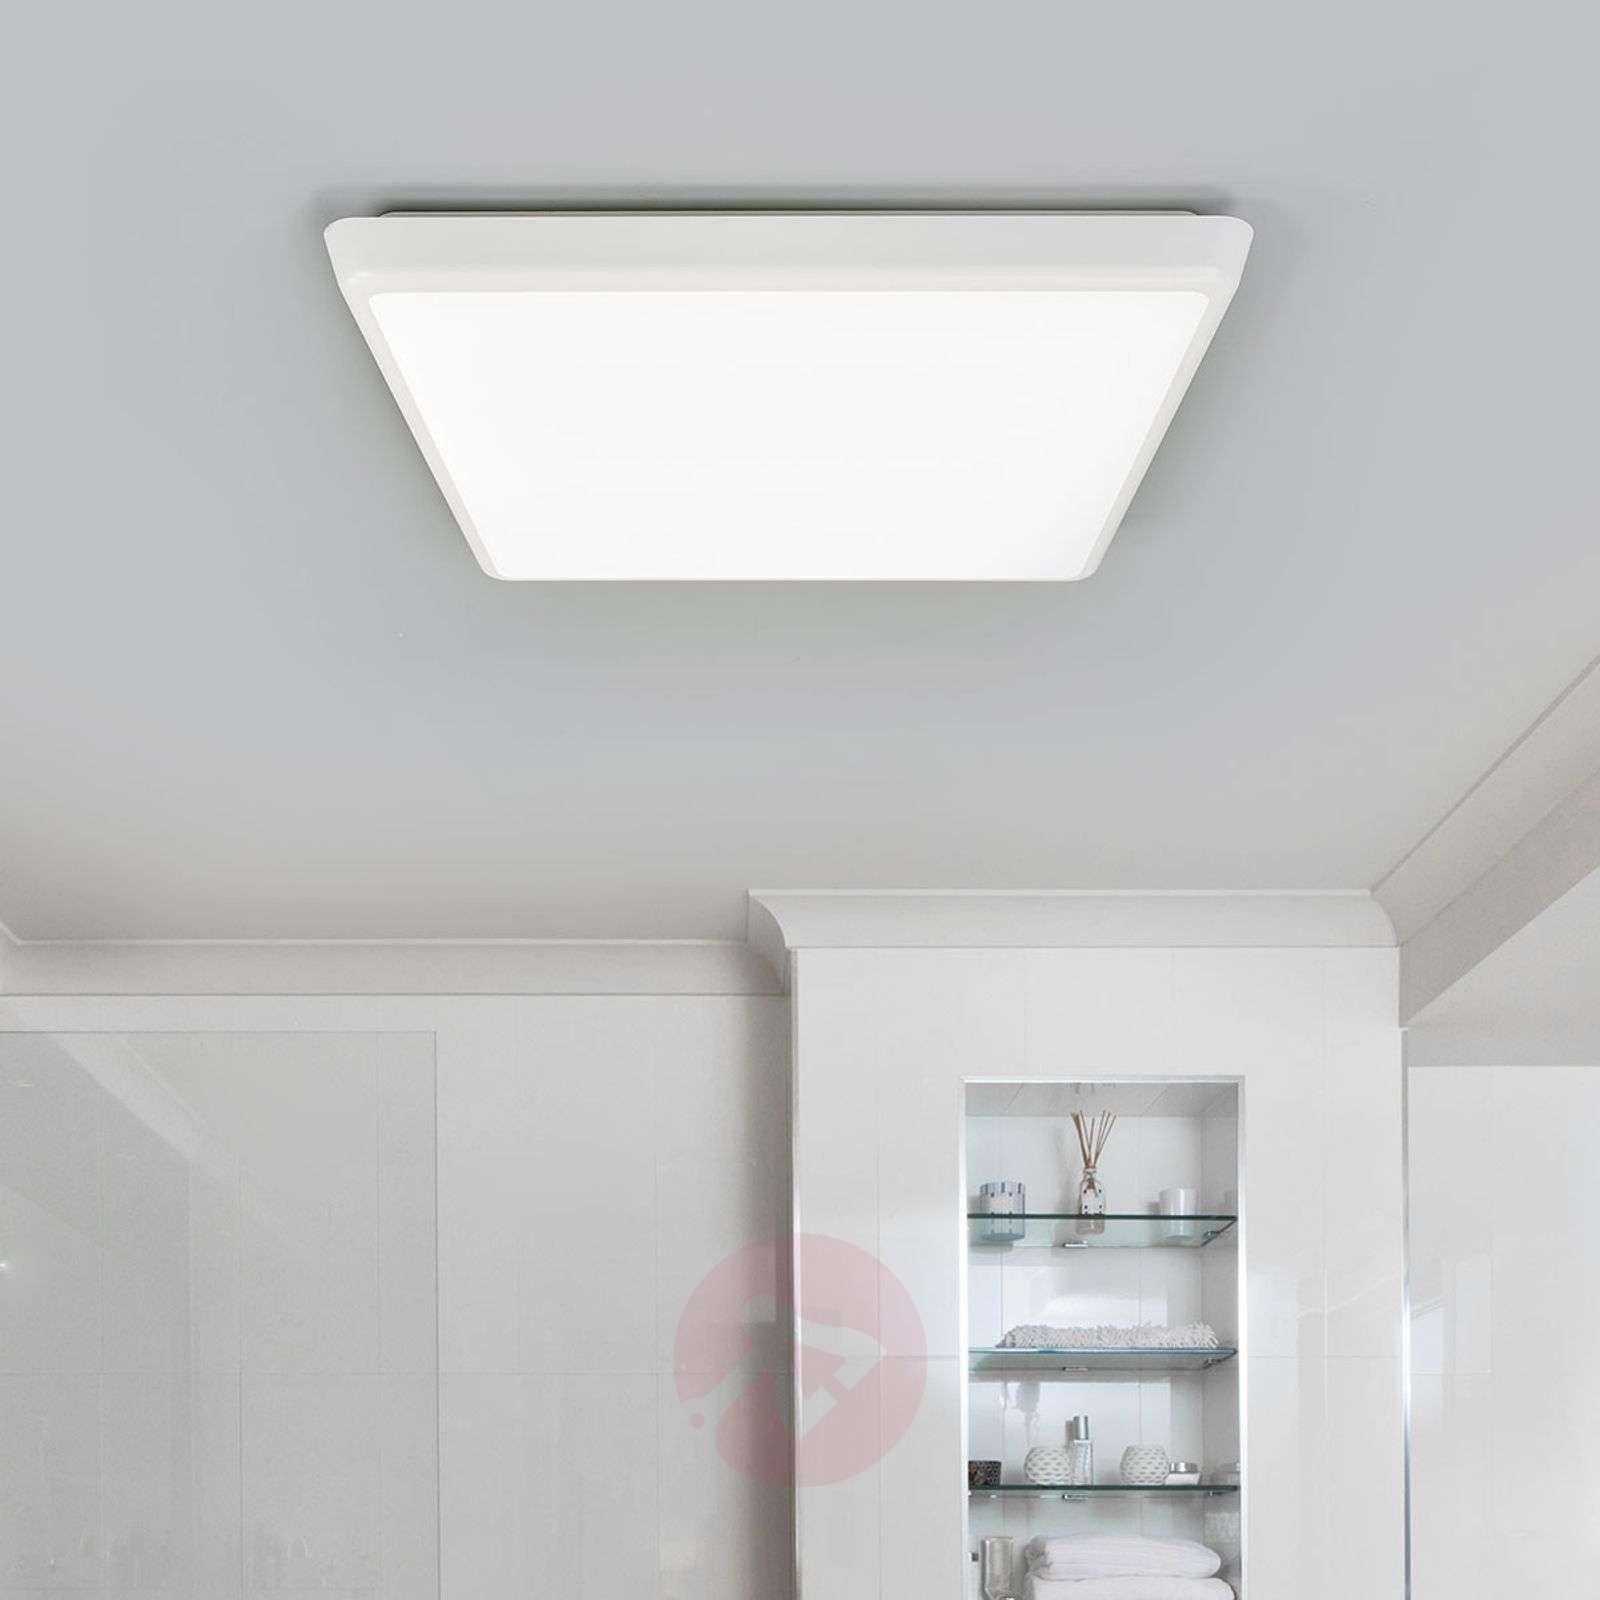 Discreet LED ceiling lamp Augustin, IP54 40cm-9967012-01